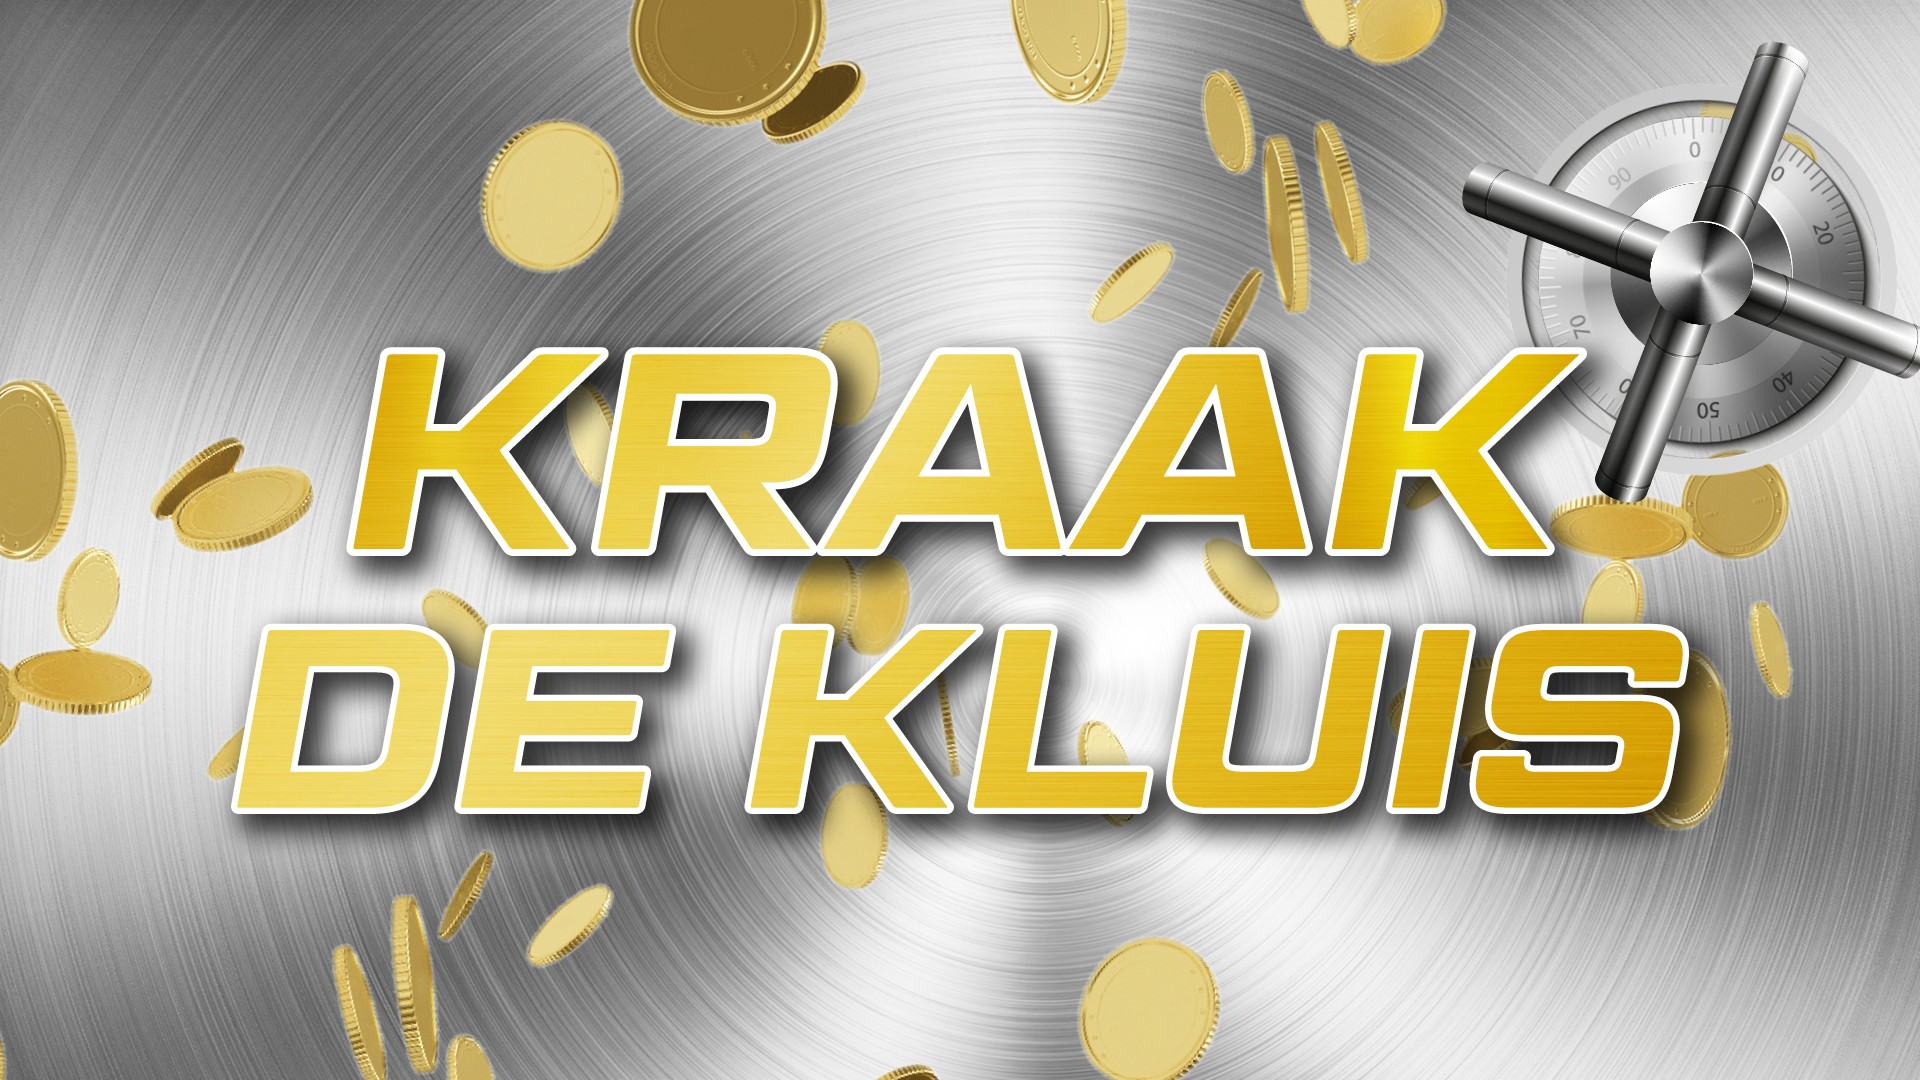 FL_Pkt_web_Kraakdekluis_8sept20.jpg